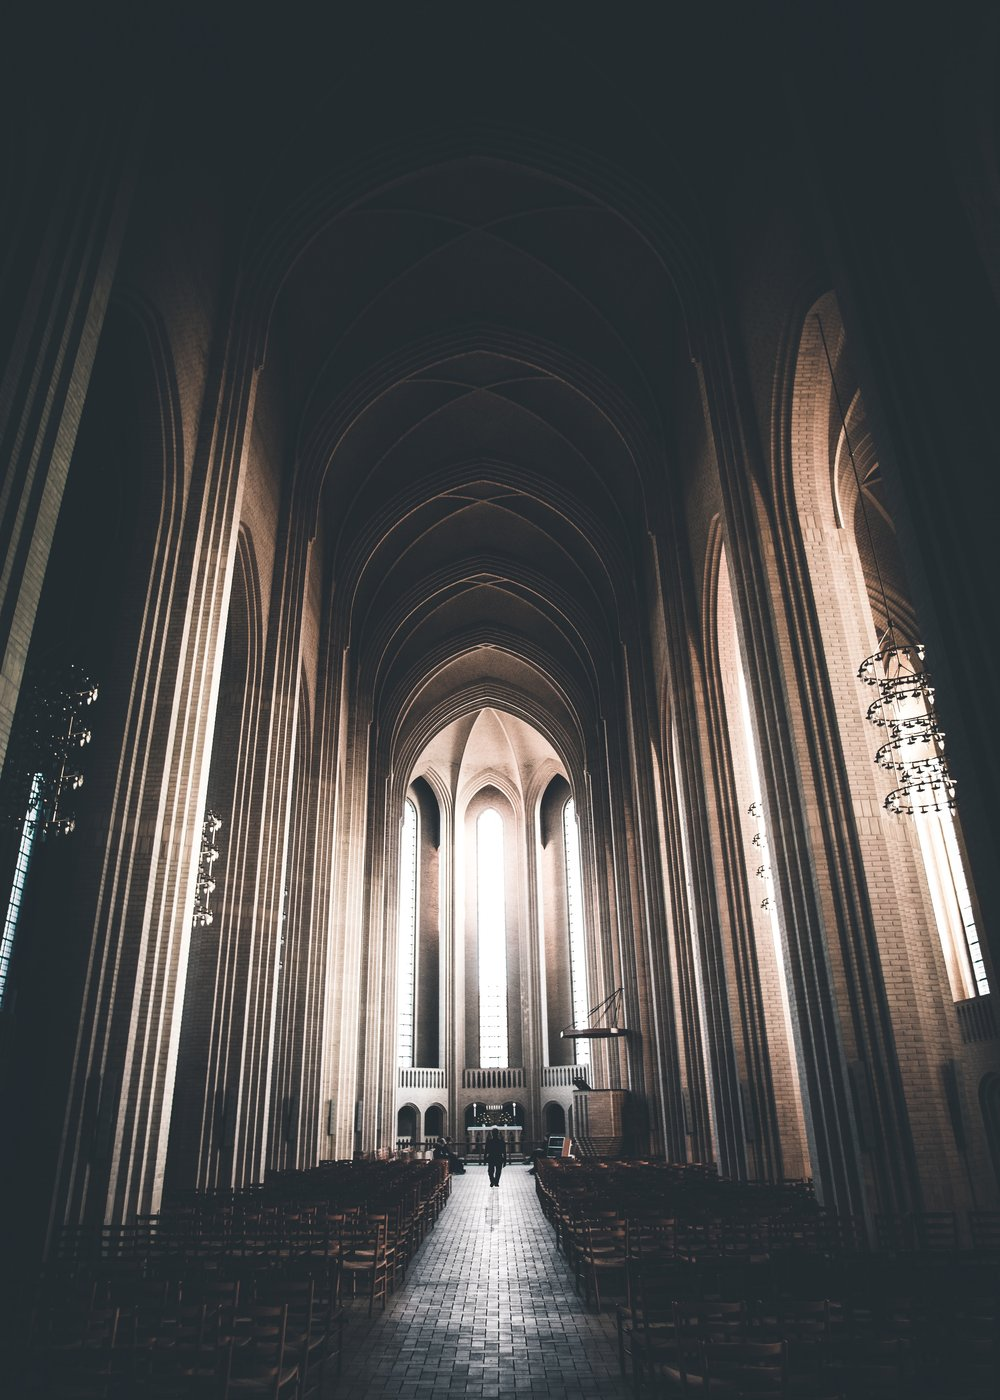 Photo by Kasper Rasmus